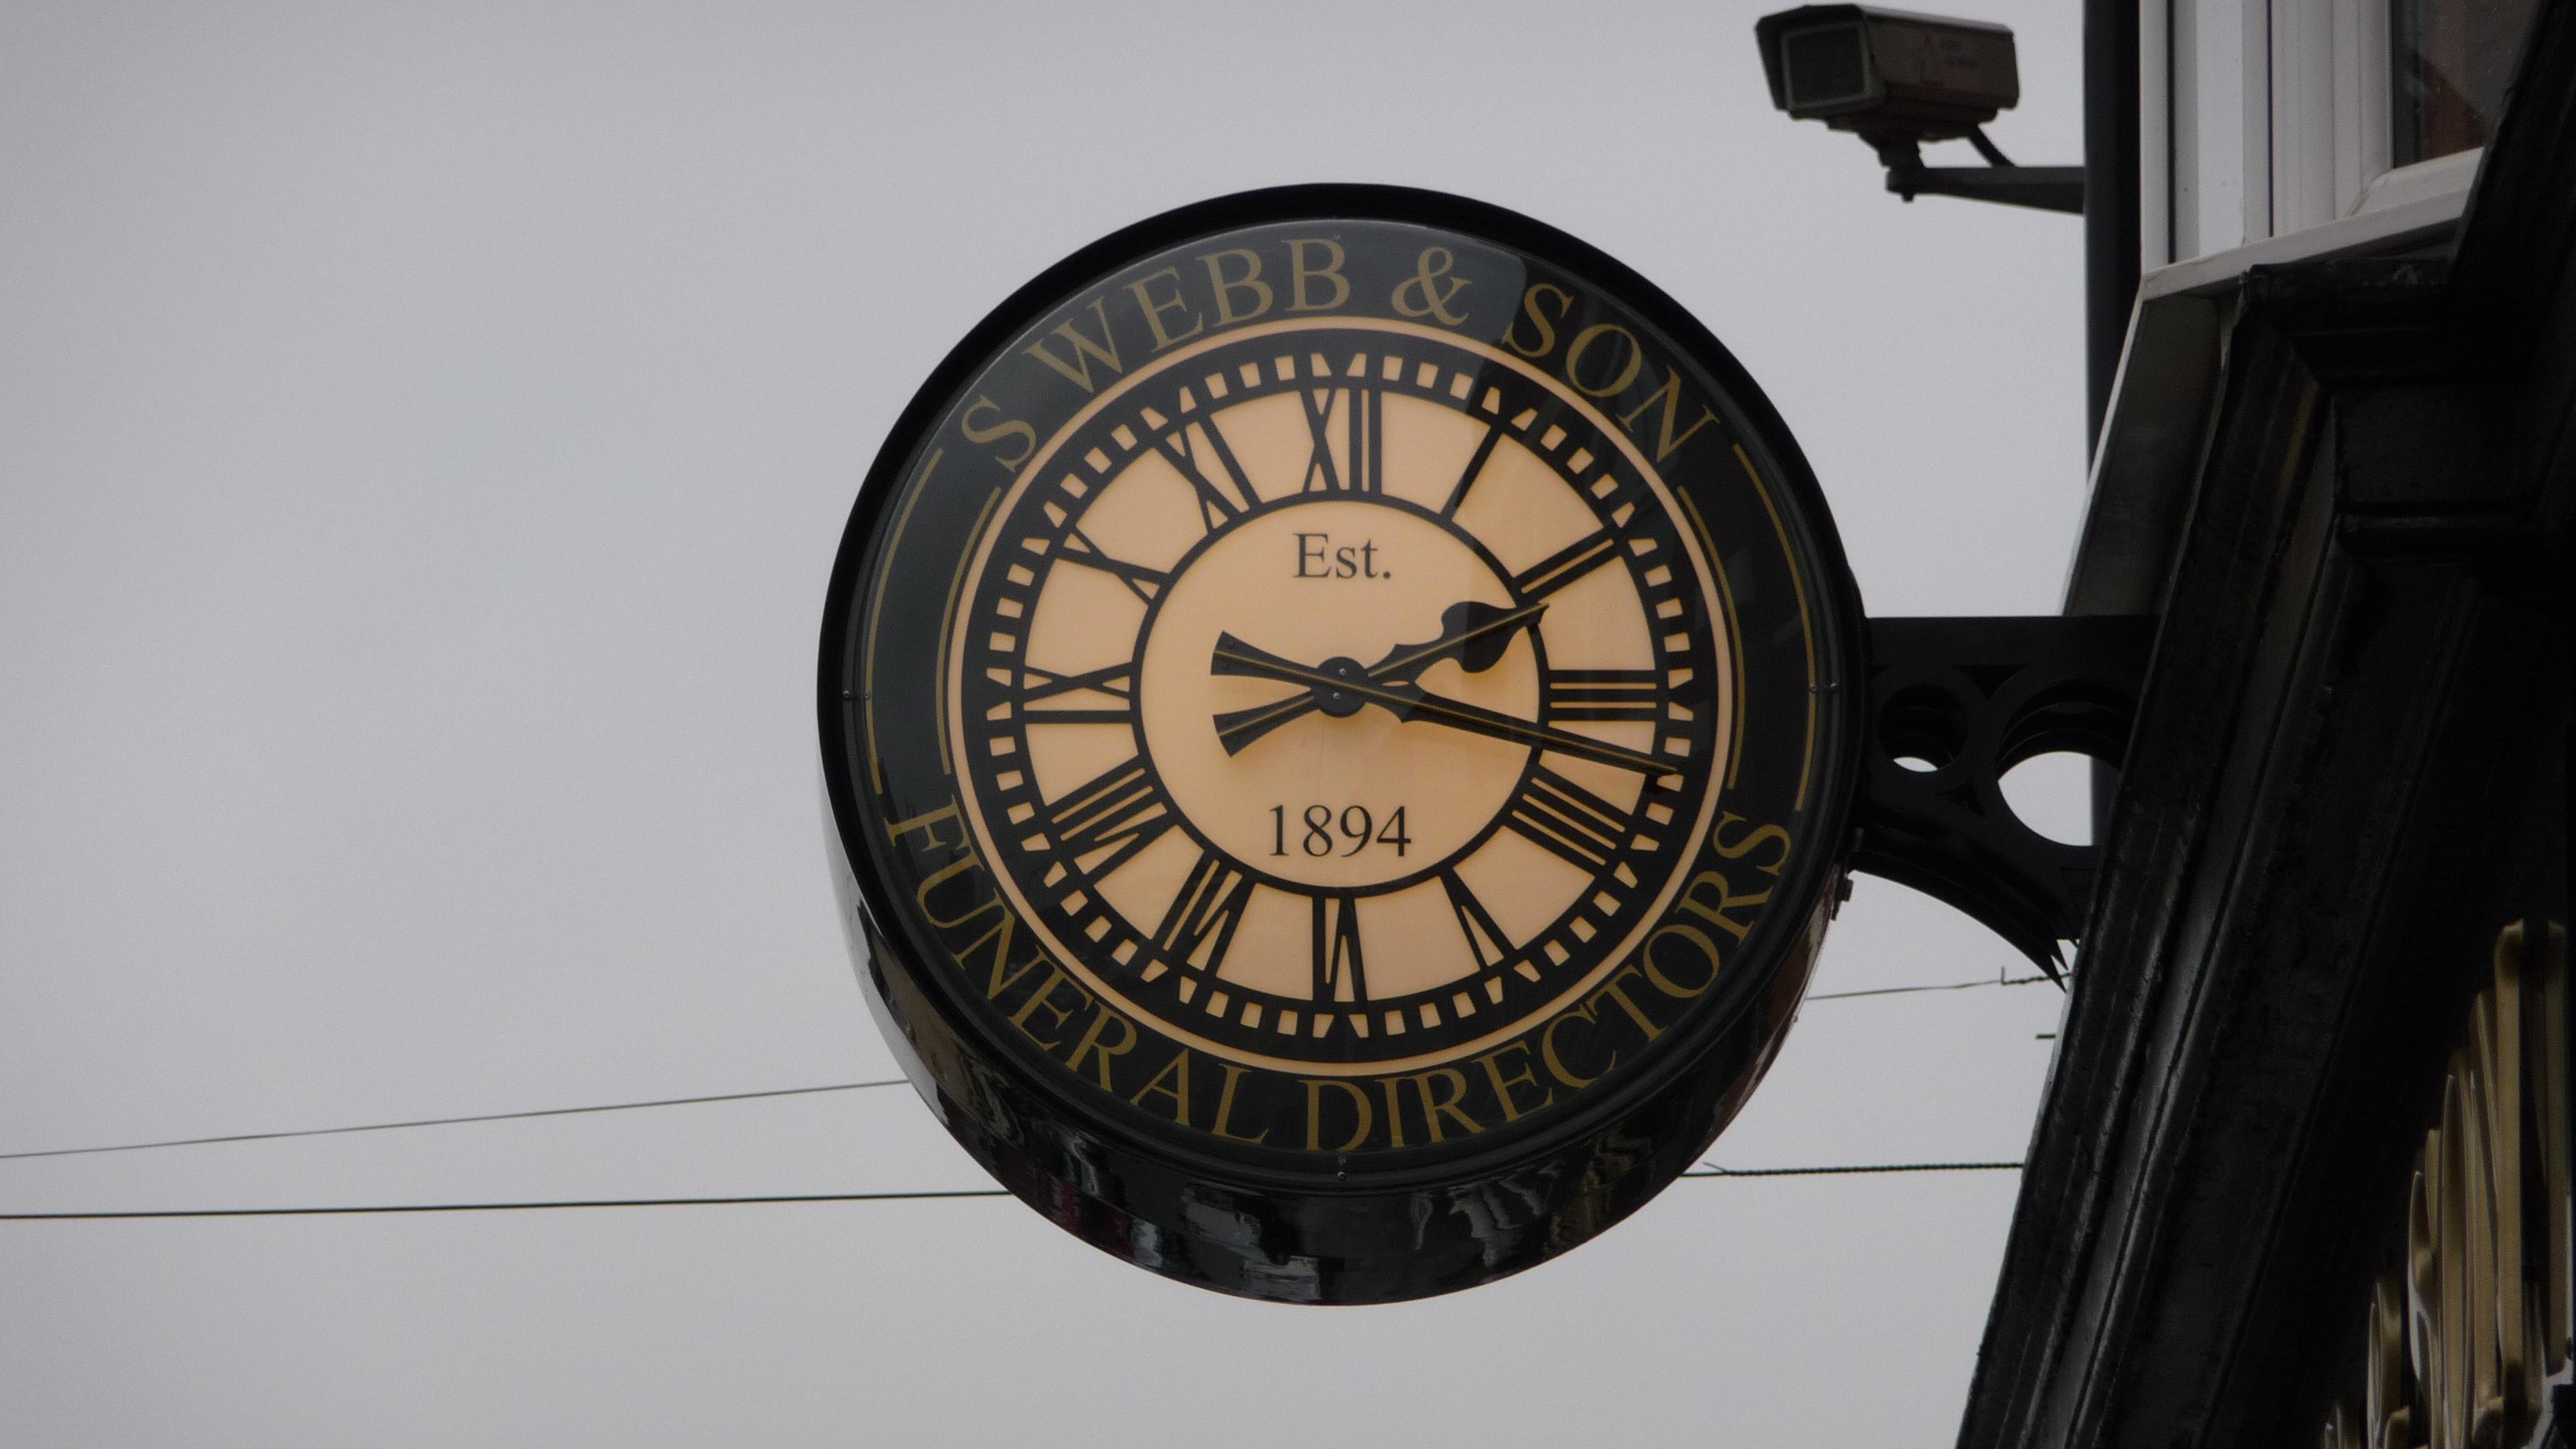 Drum clock for Funeral Directors